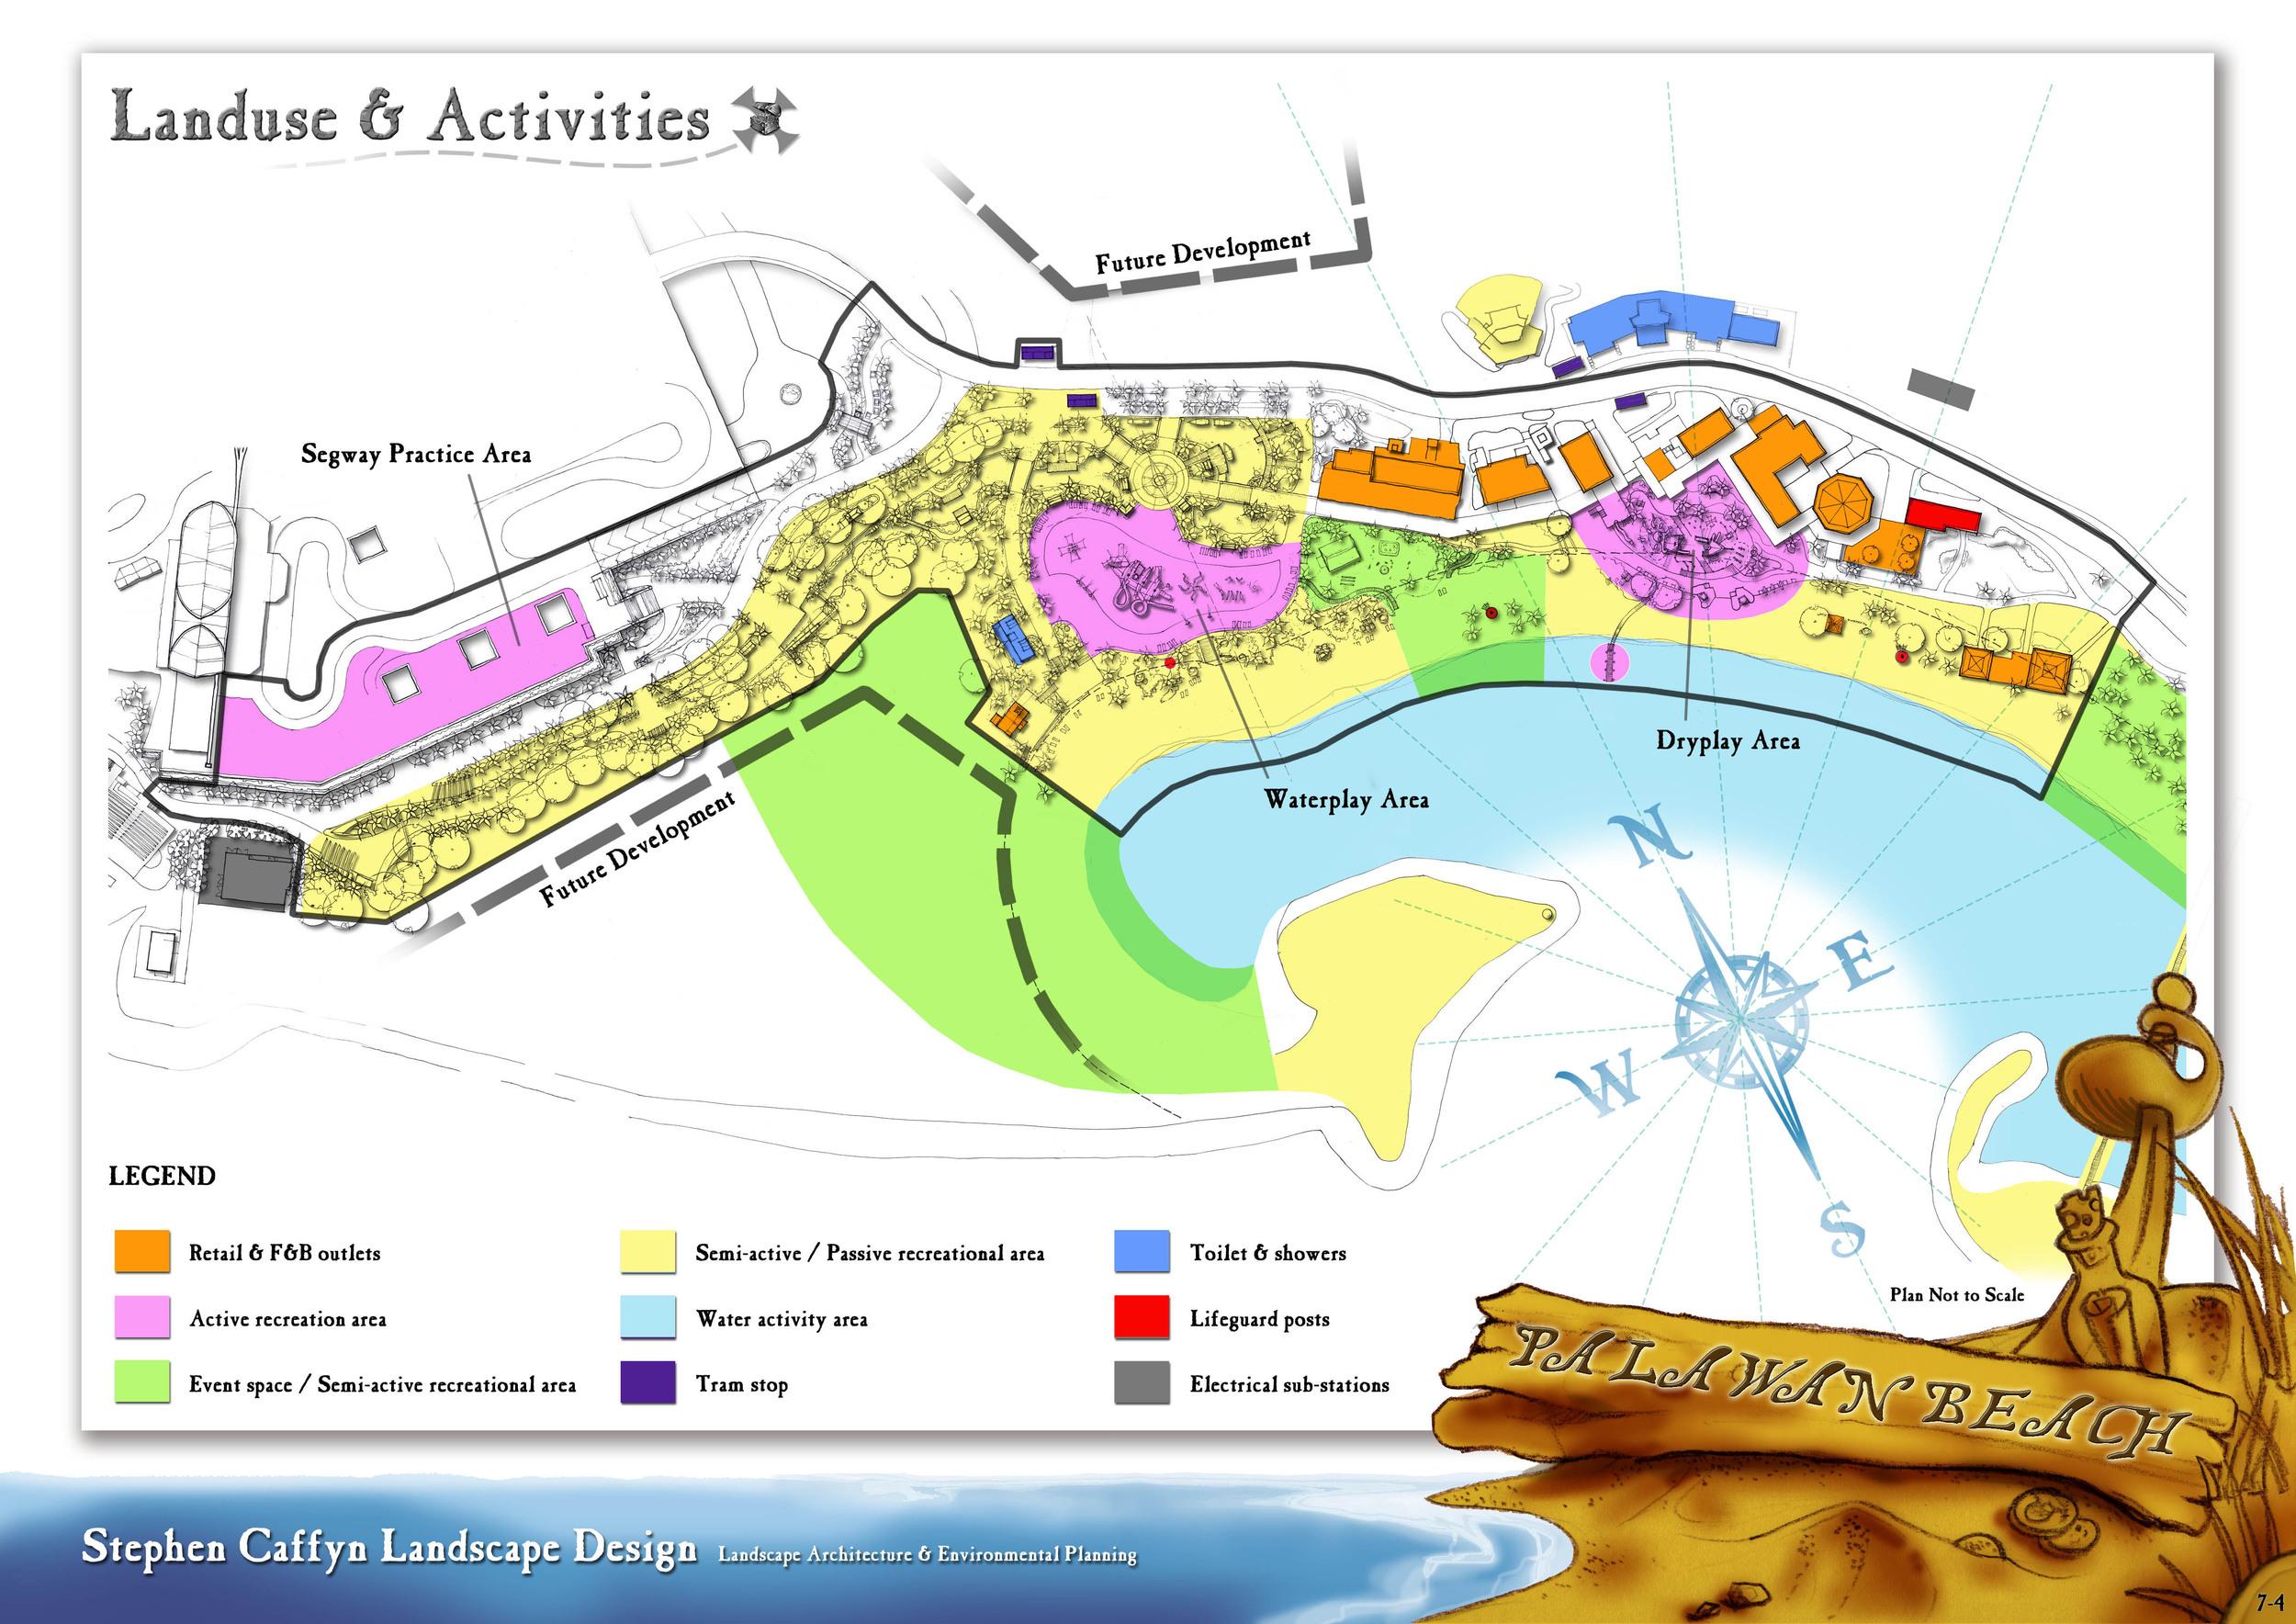 7-4 Landuse & Activities copy.jpg